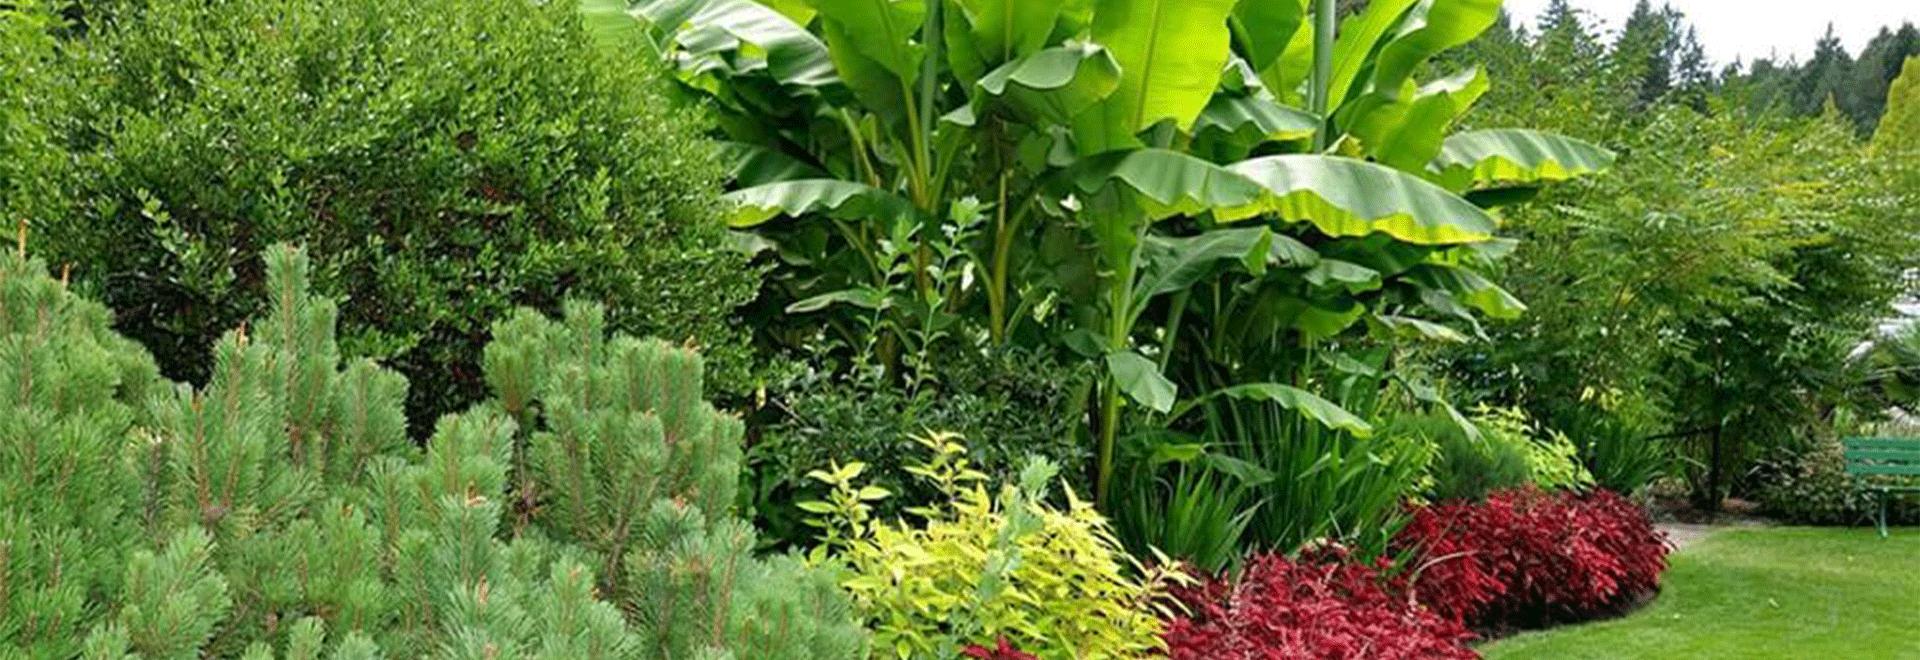 bitki-haklari65-10.png